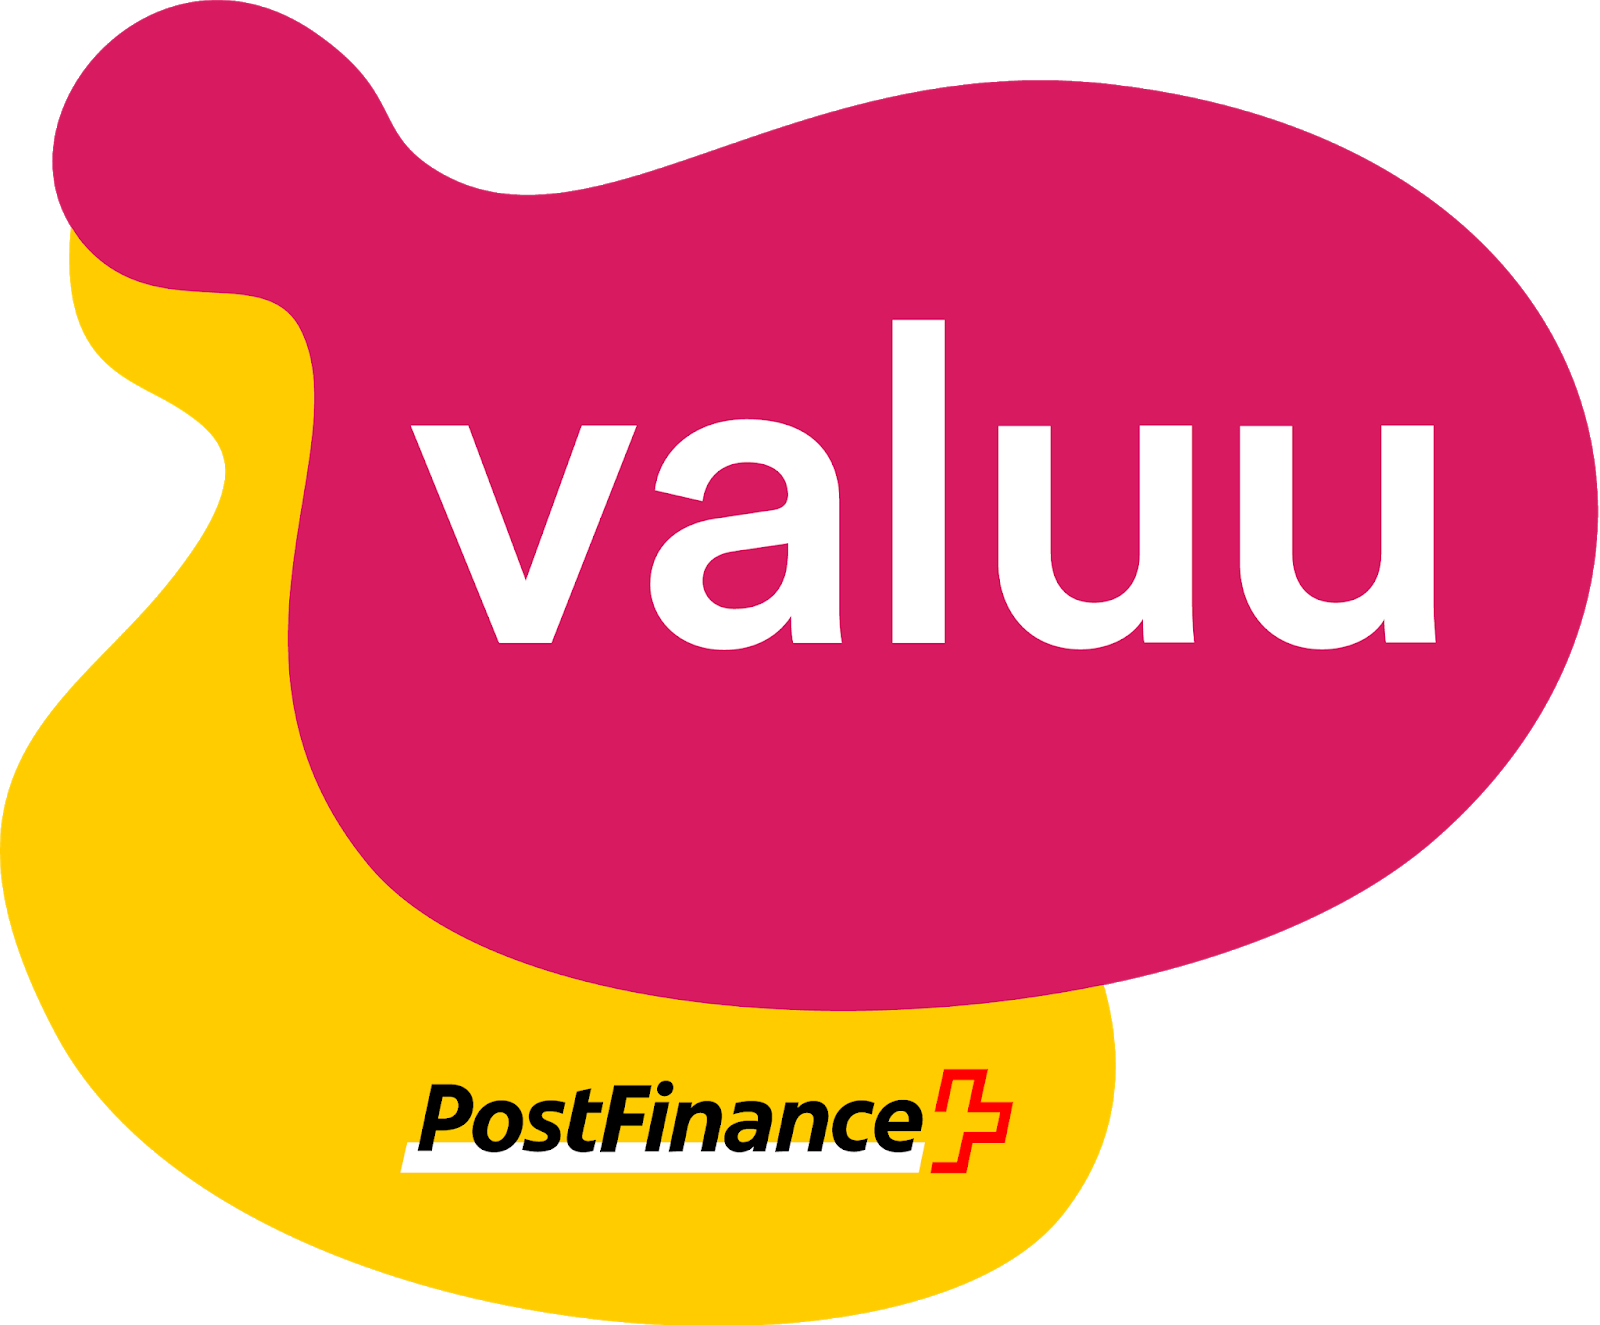 Logo valuu by PostFinance